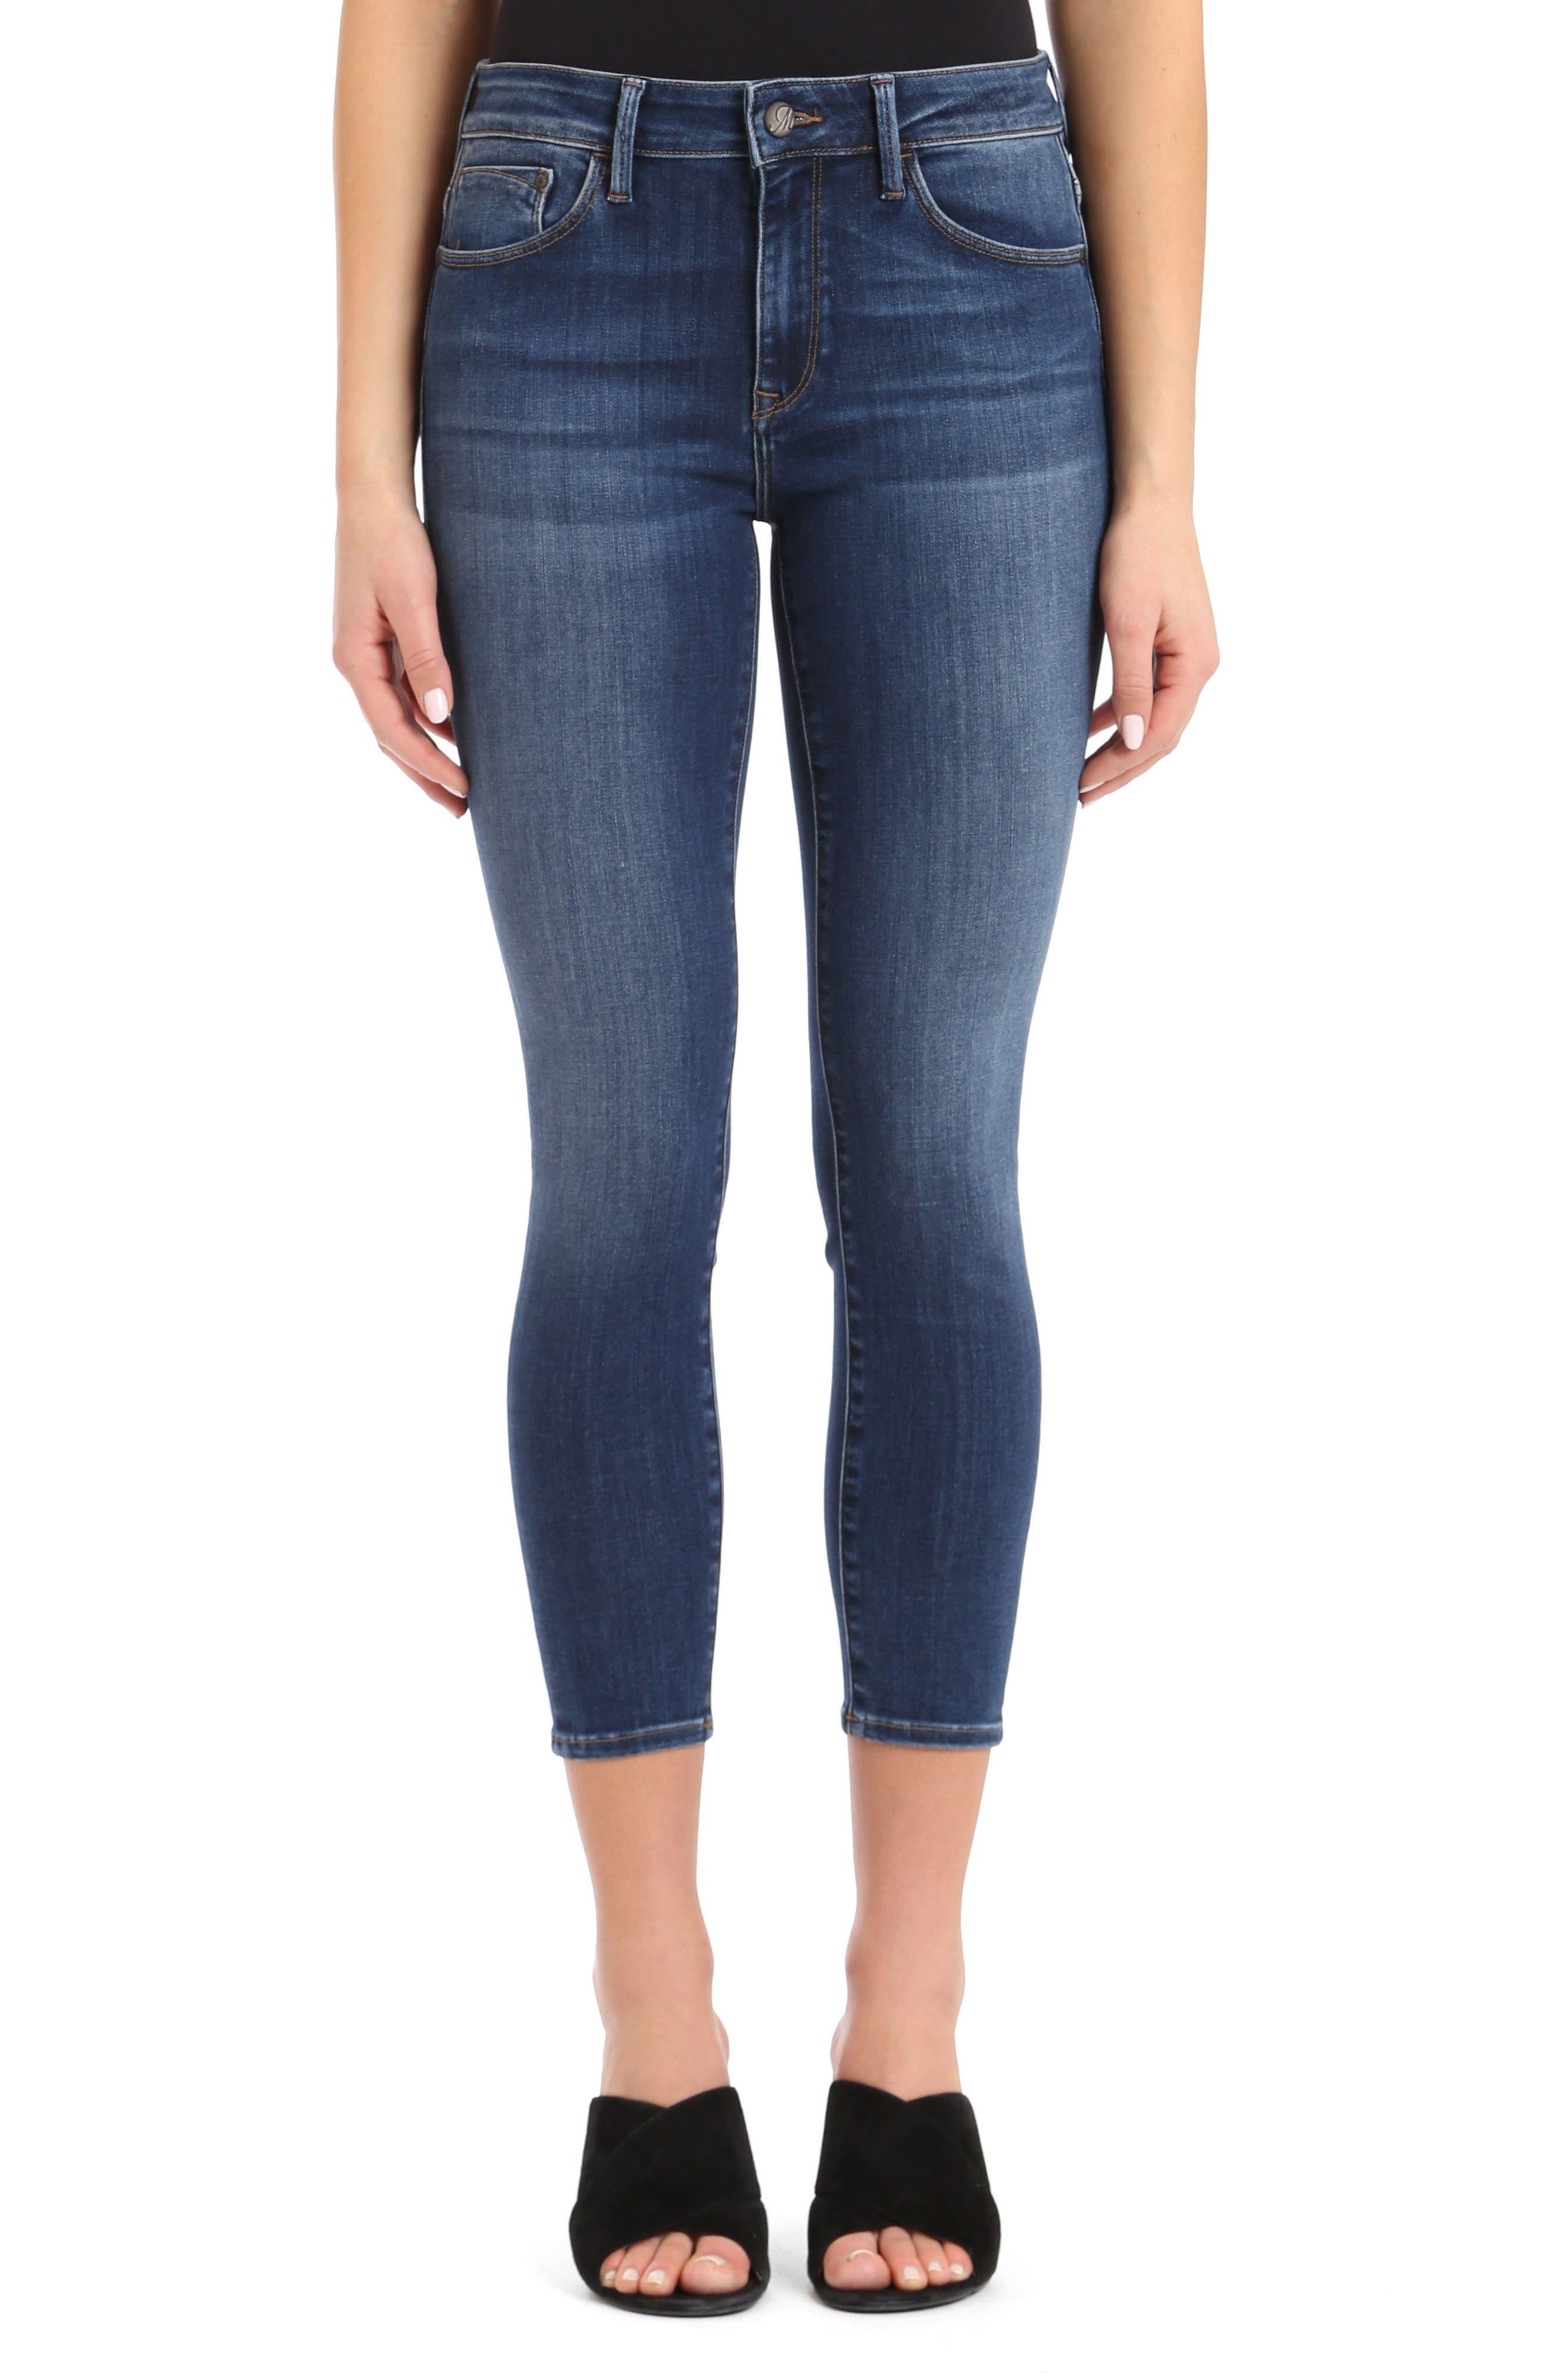 MAVI JEANS Mavi Tess Crop Skinny Jeans in Indigo Super Soft